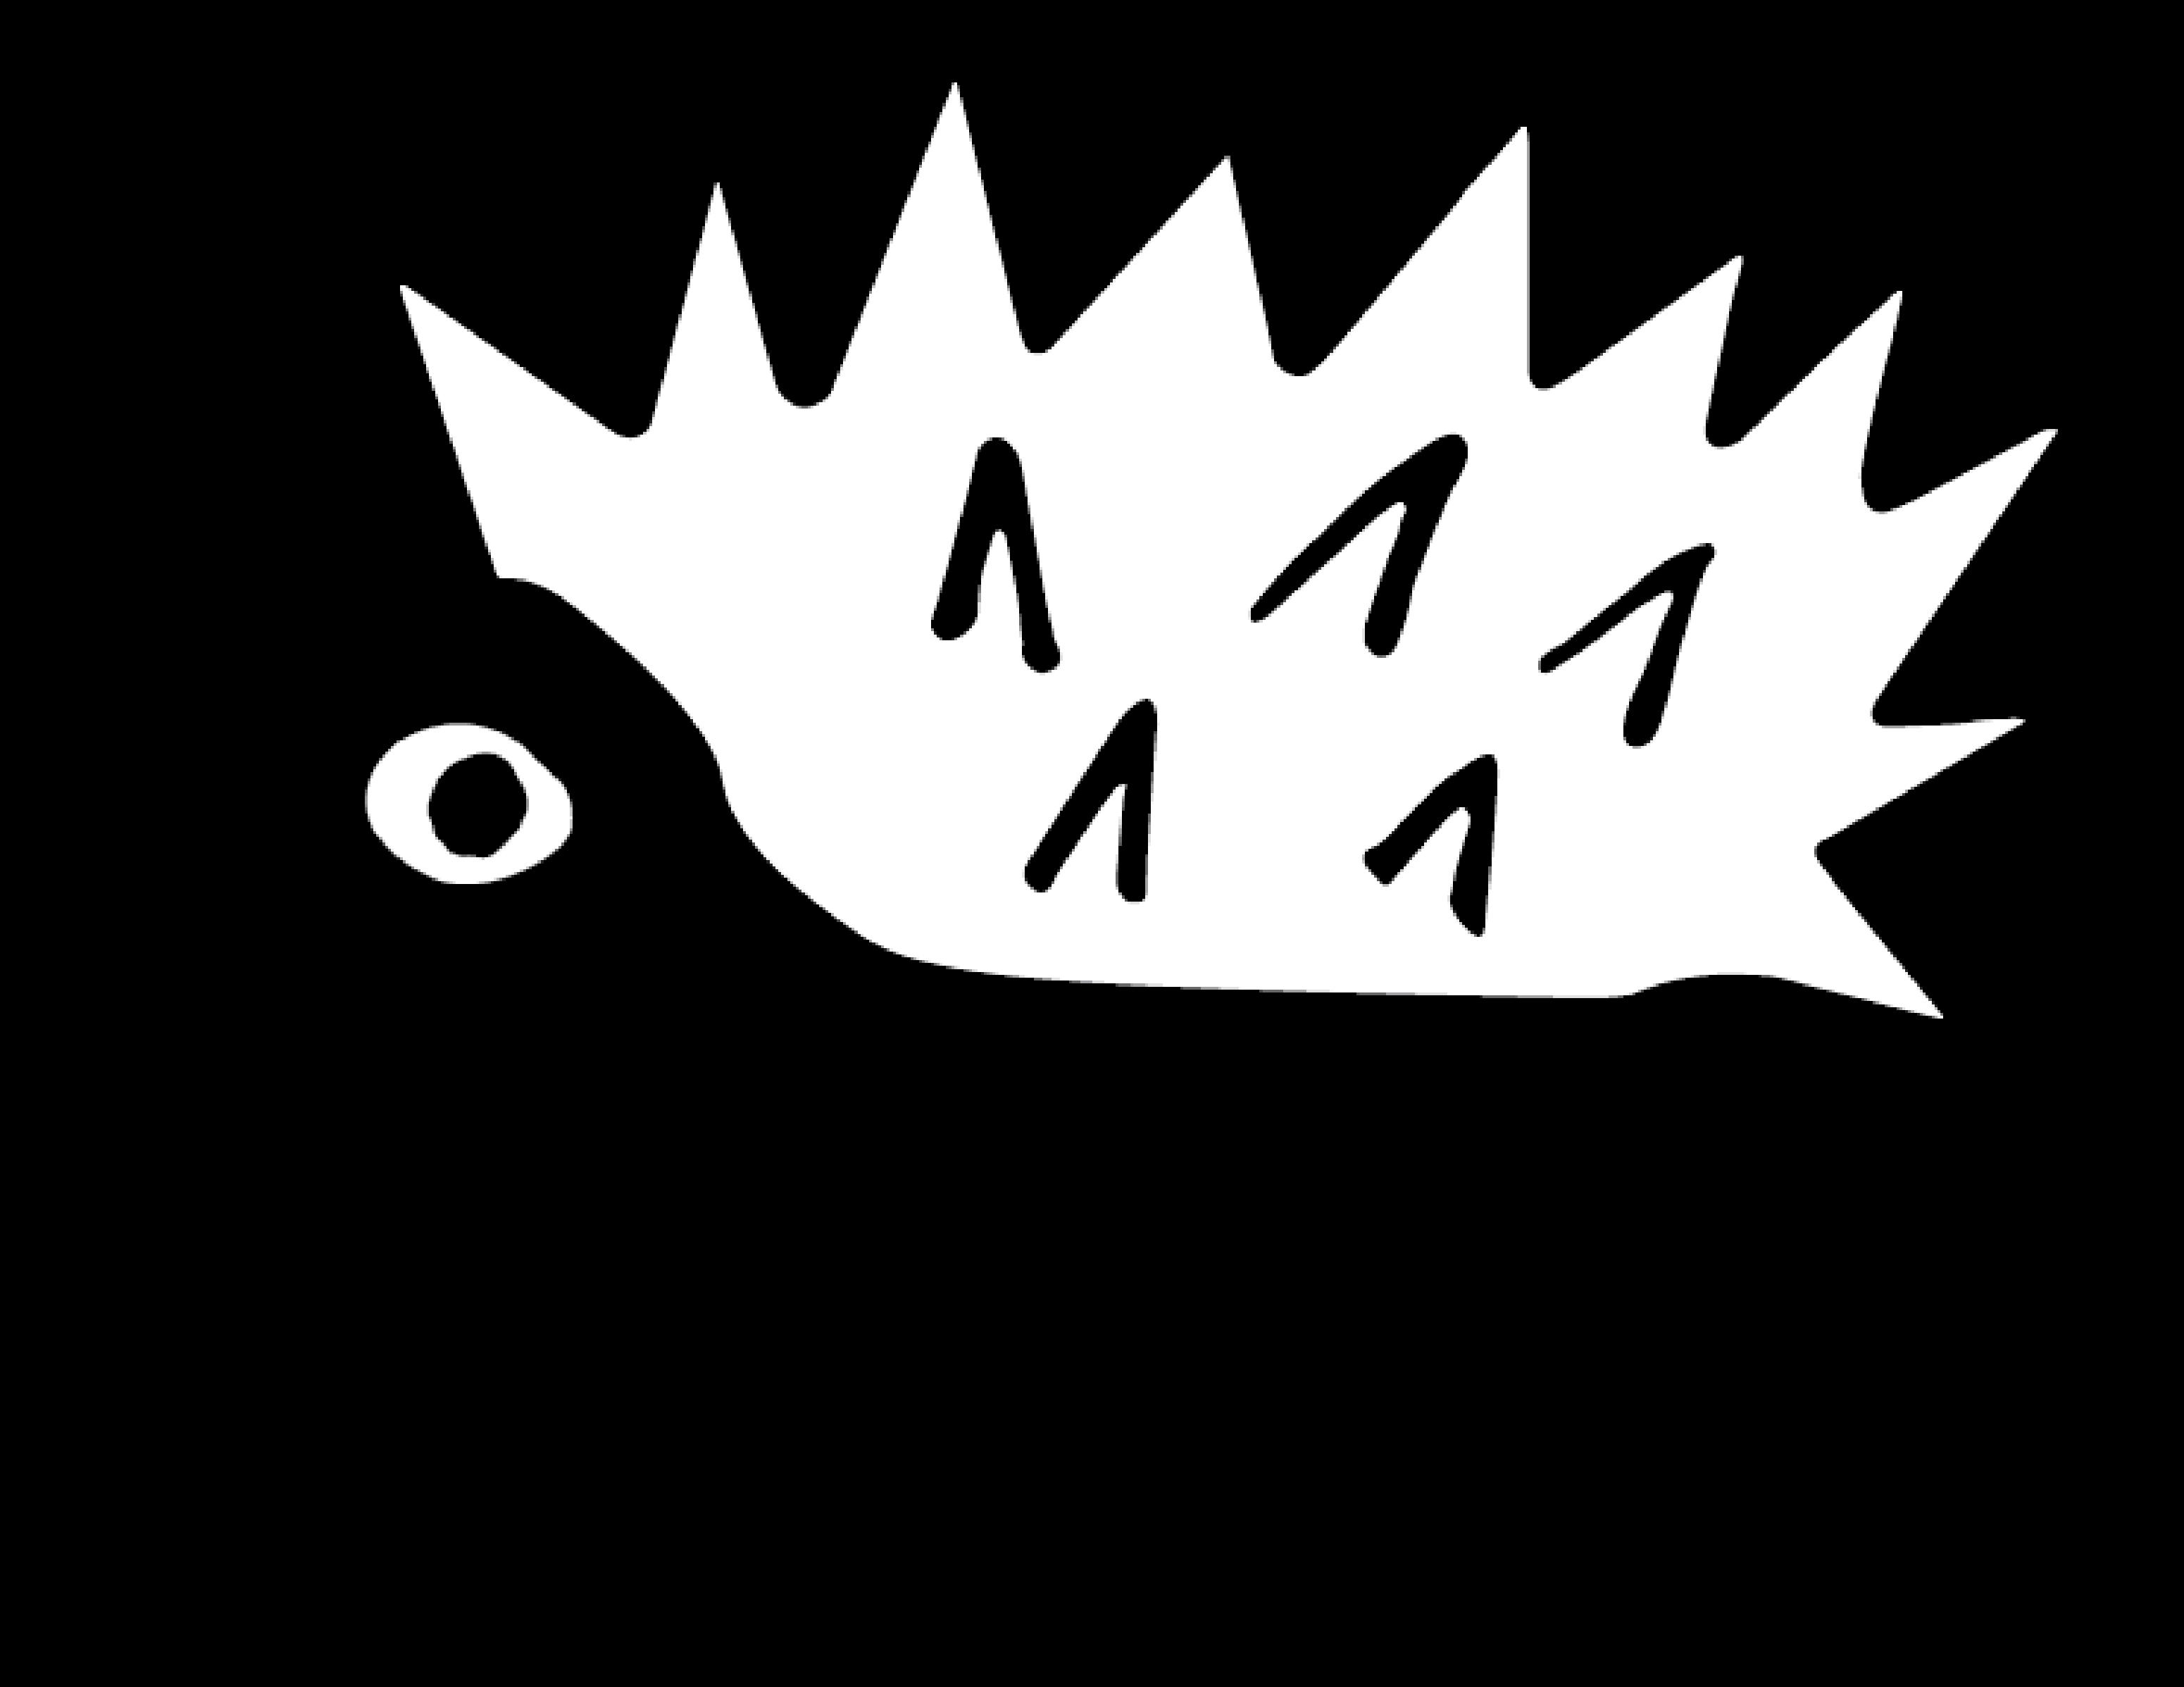 Porcupine Book